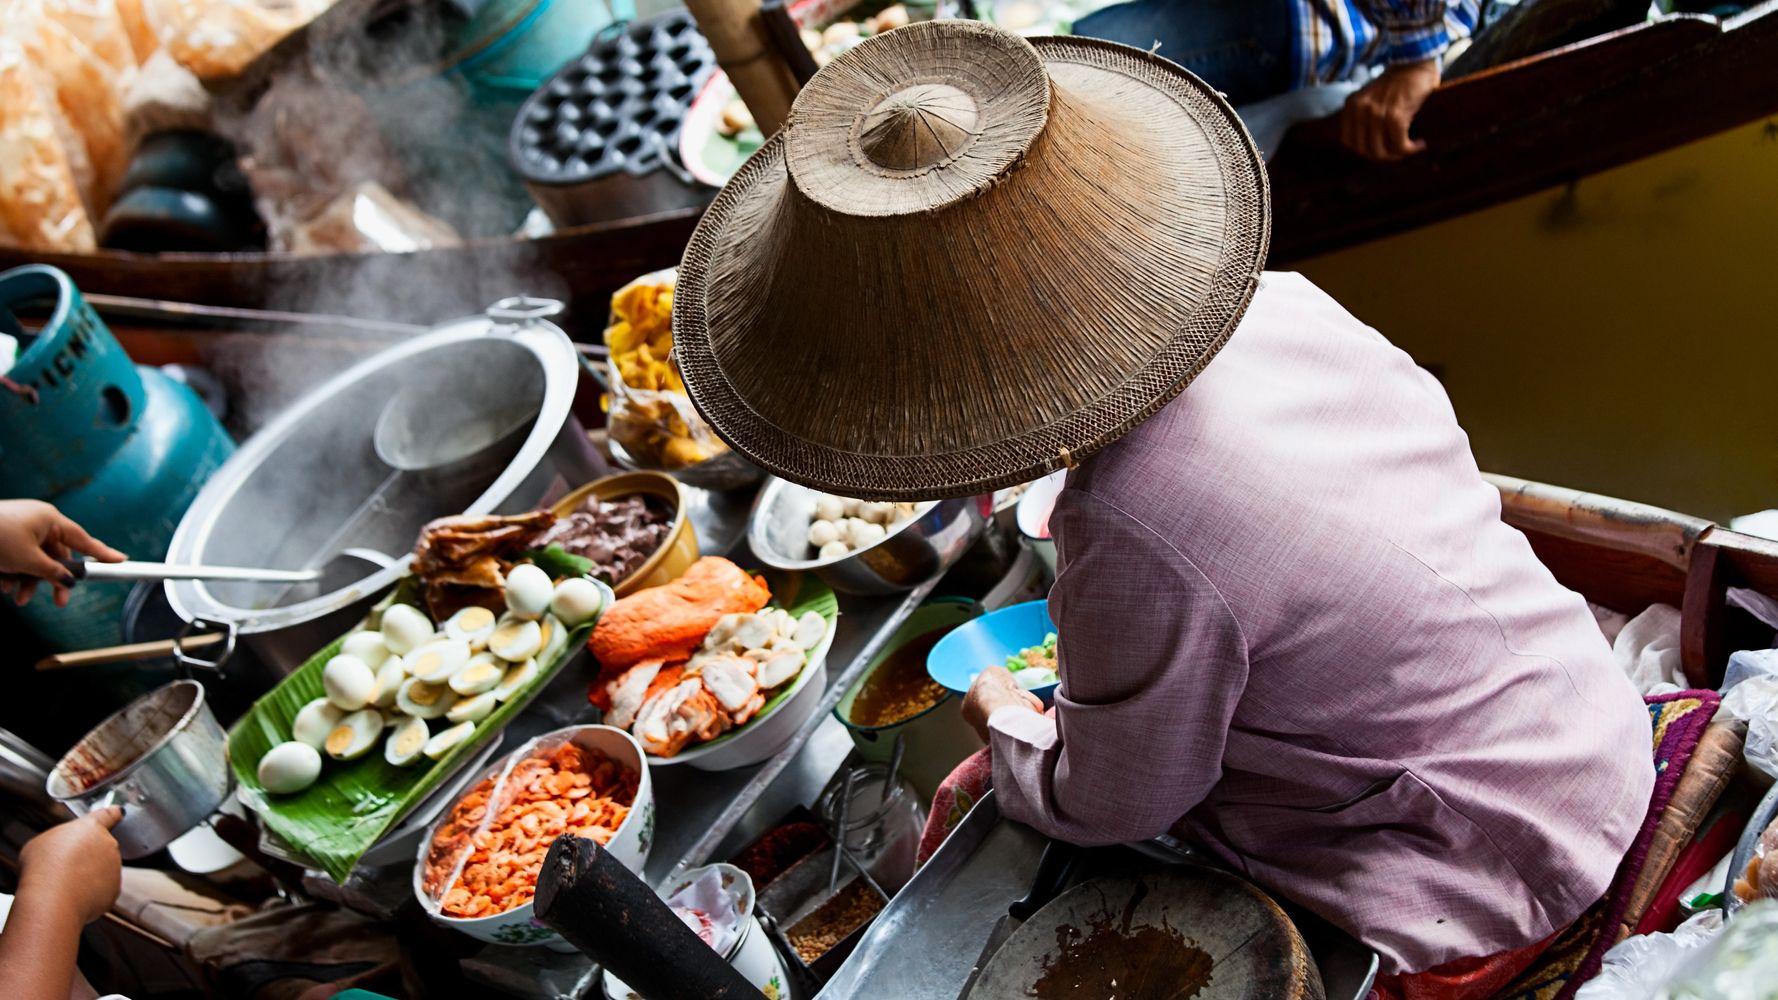 The World's Best Food Cities, According To TripAdvisor